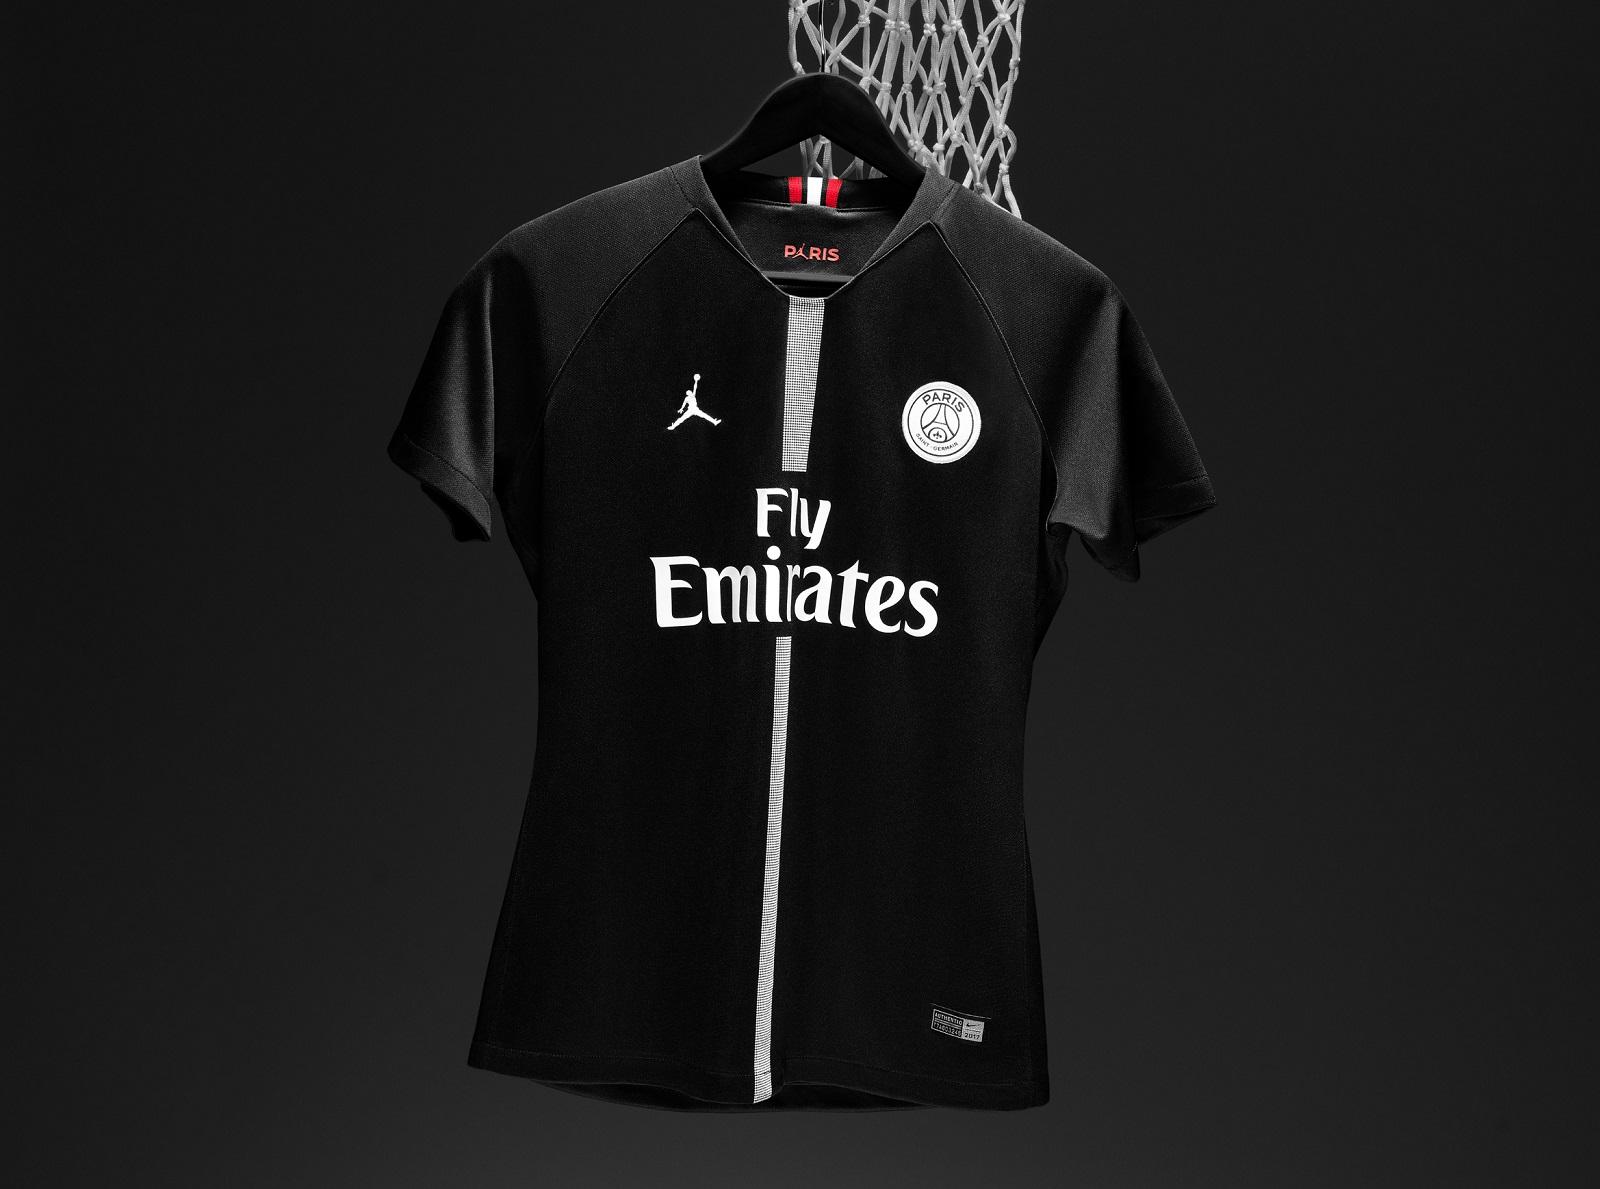 Jordan Brand Paris Saint-Germain First Ever Soccer Jersey  c2553dfc0